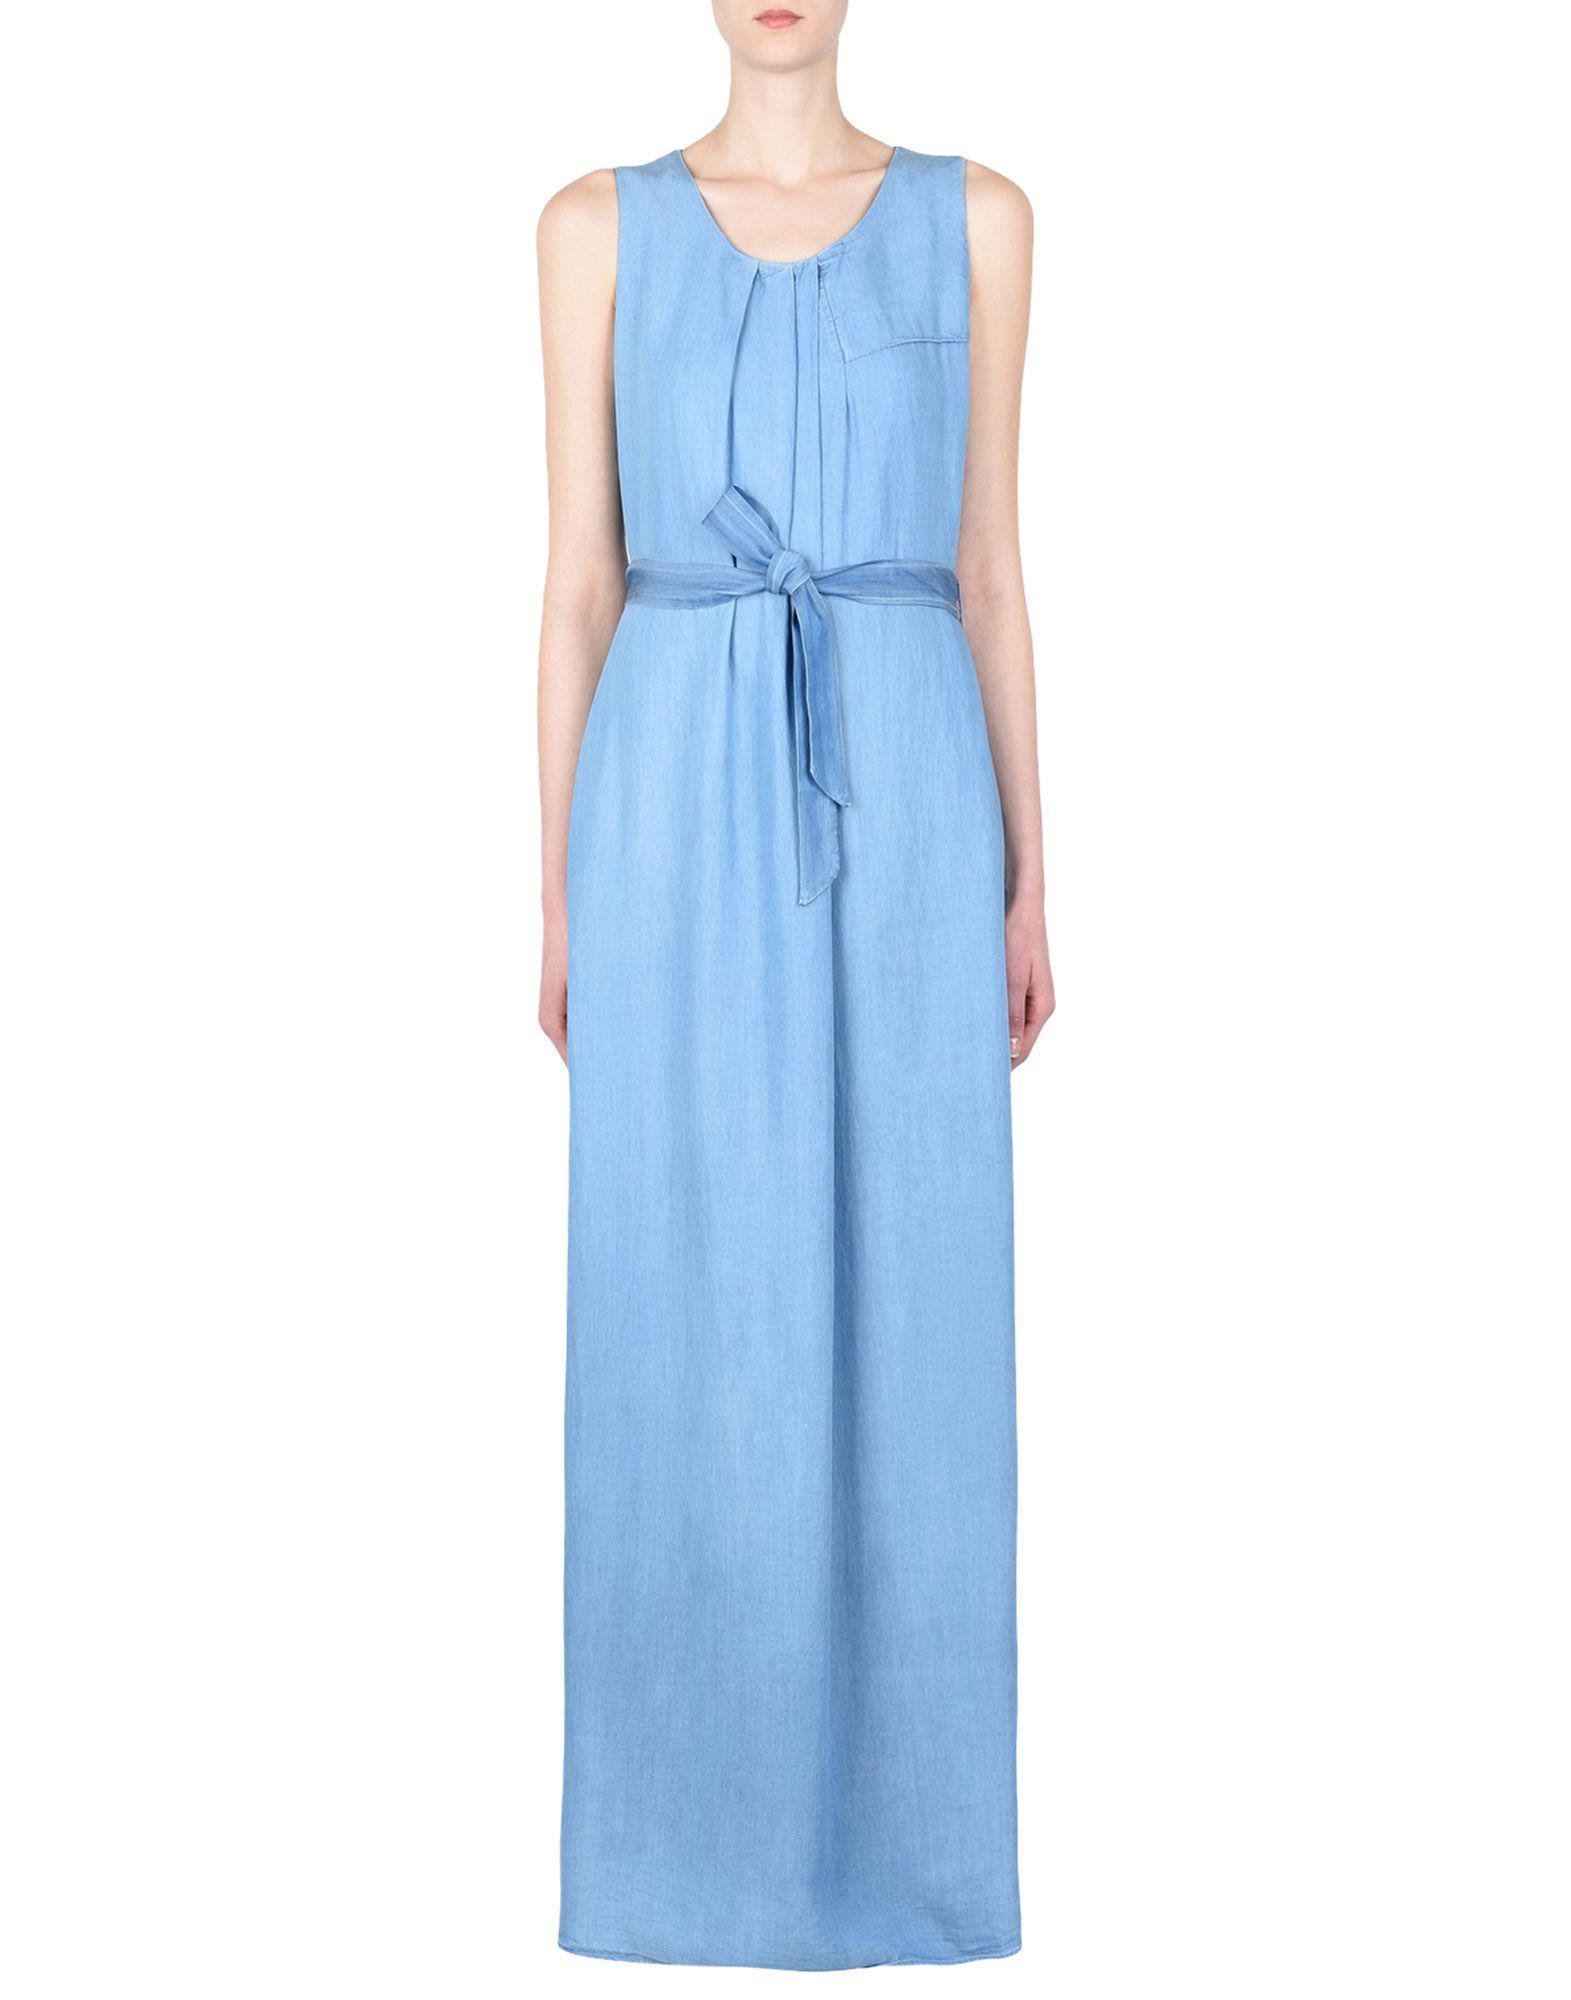 967af83814f Lyst - Robe longue Armani Jeans en coloris Bleu